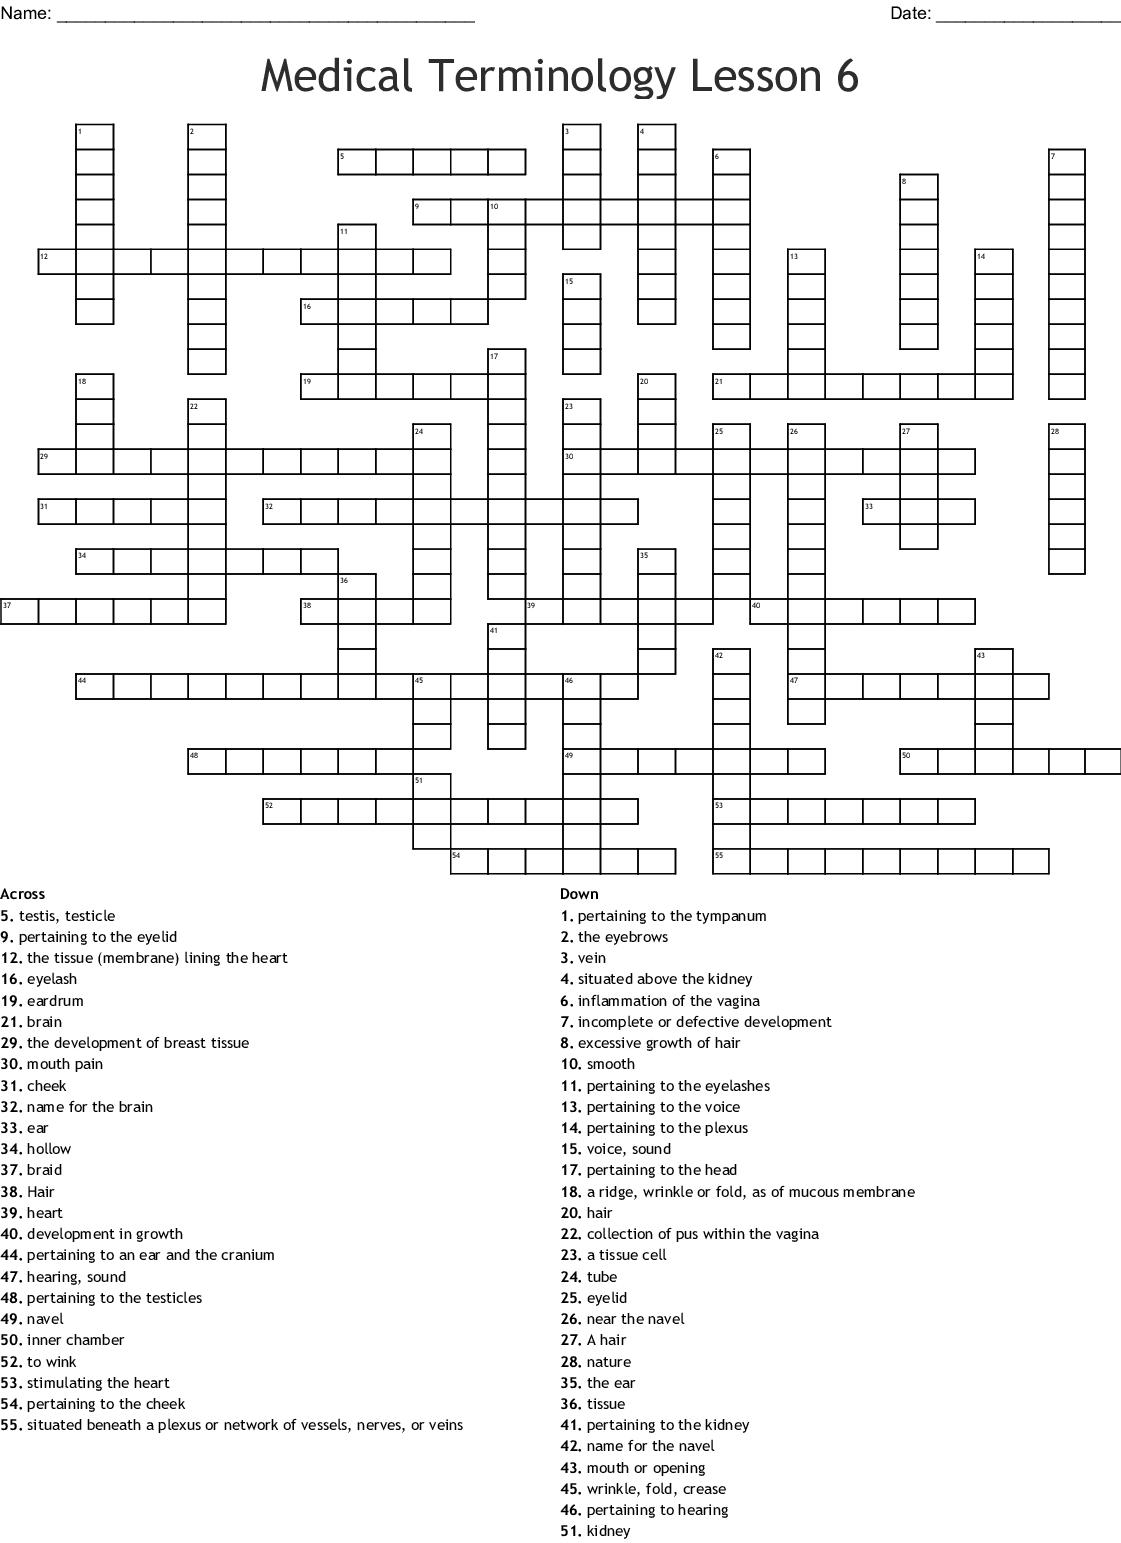 Medical Terminology Lesson 6 Worksheet